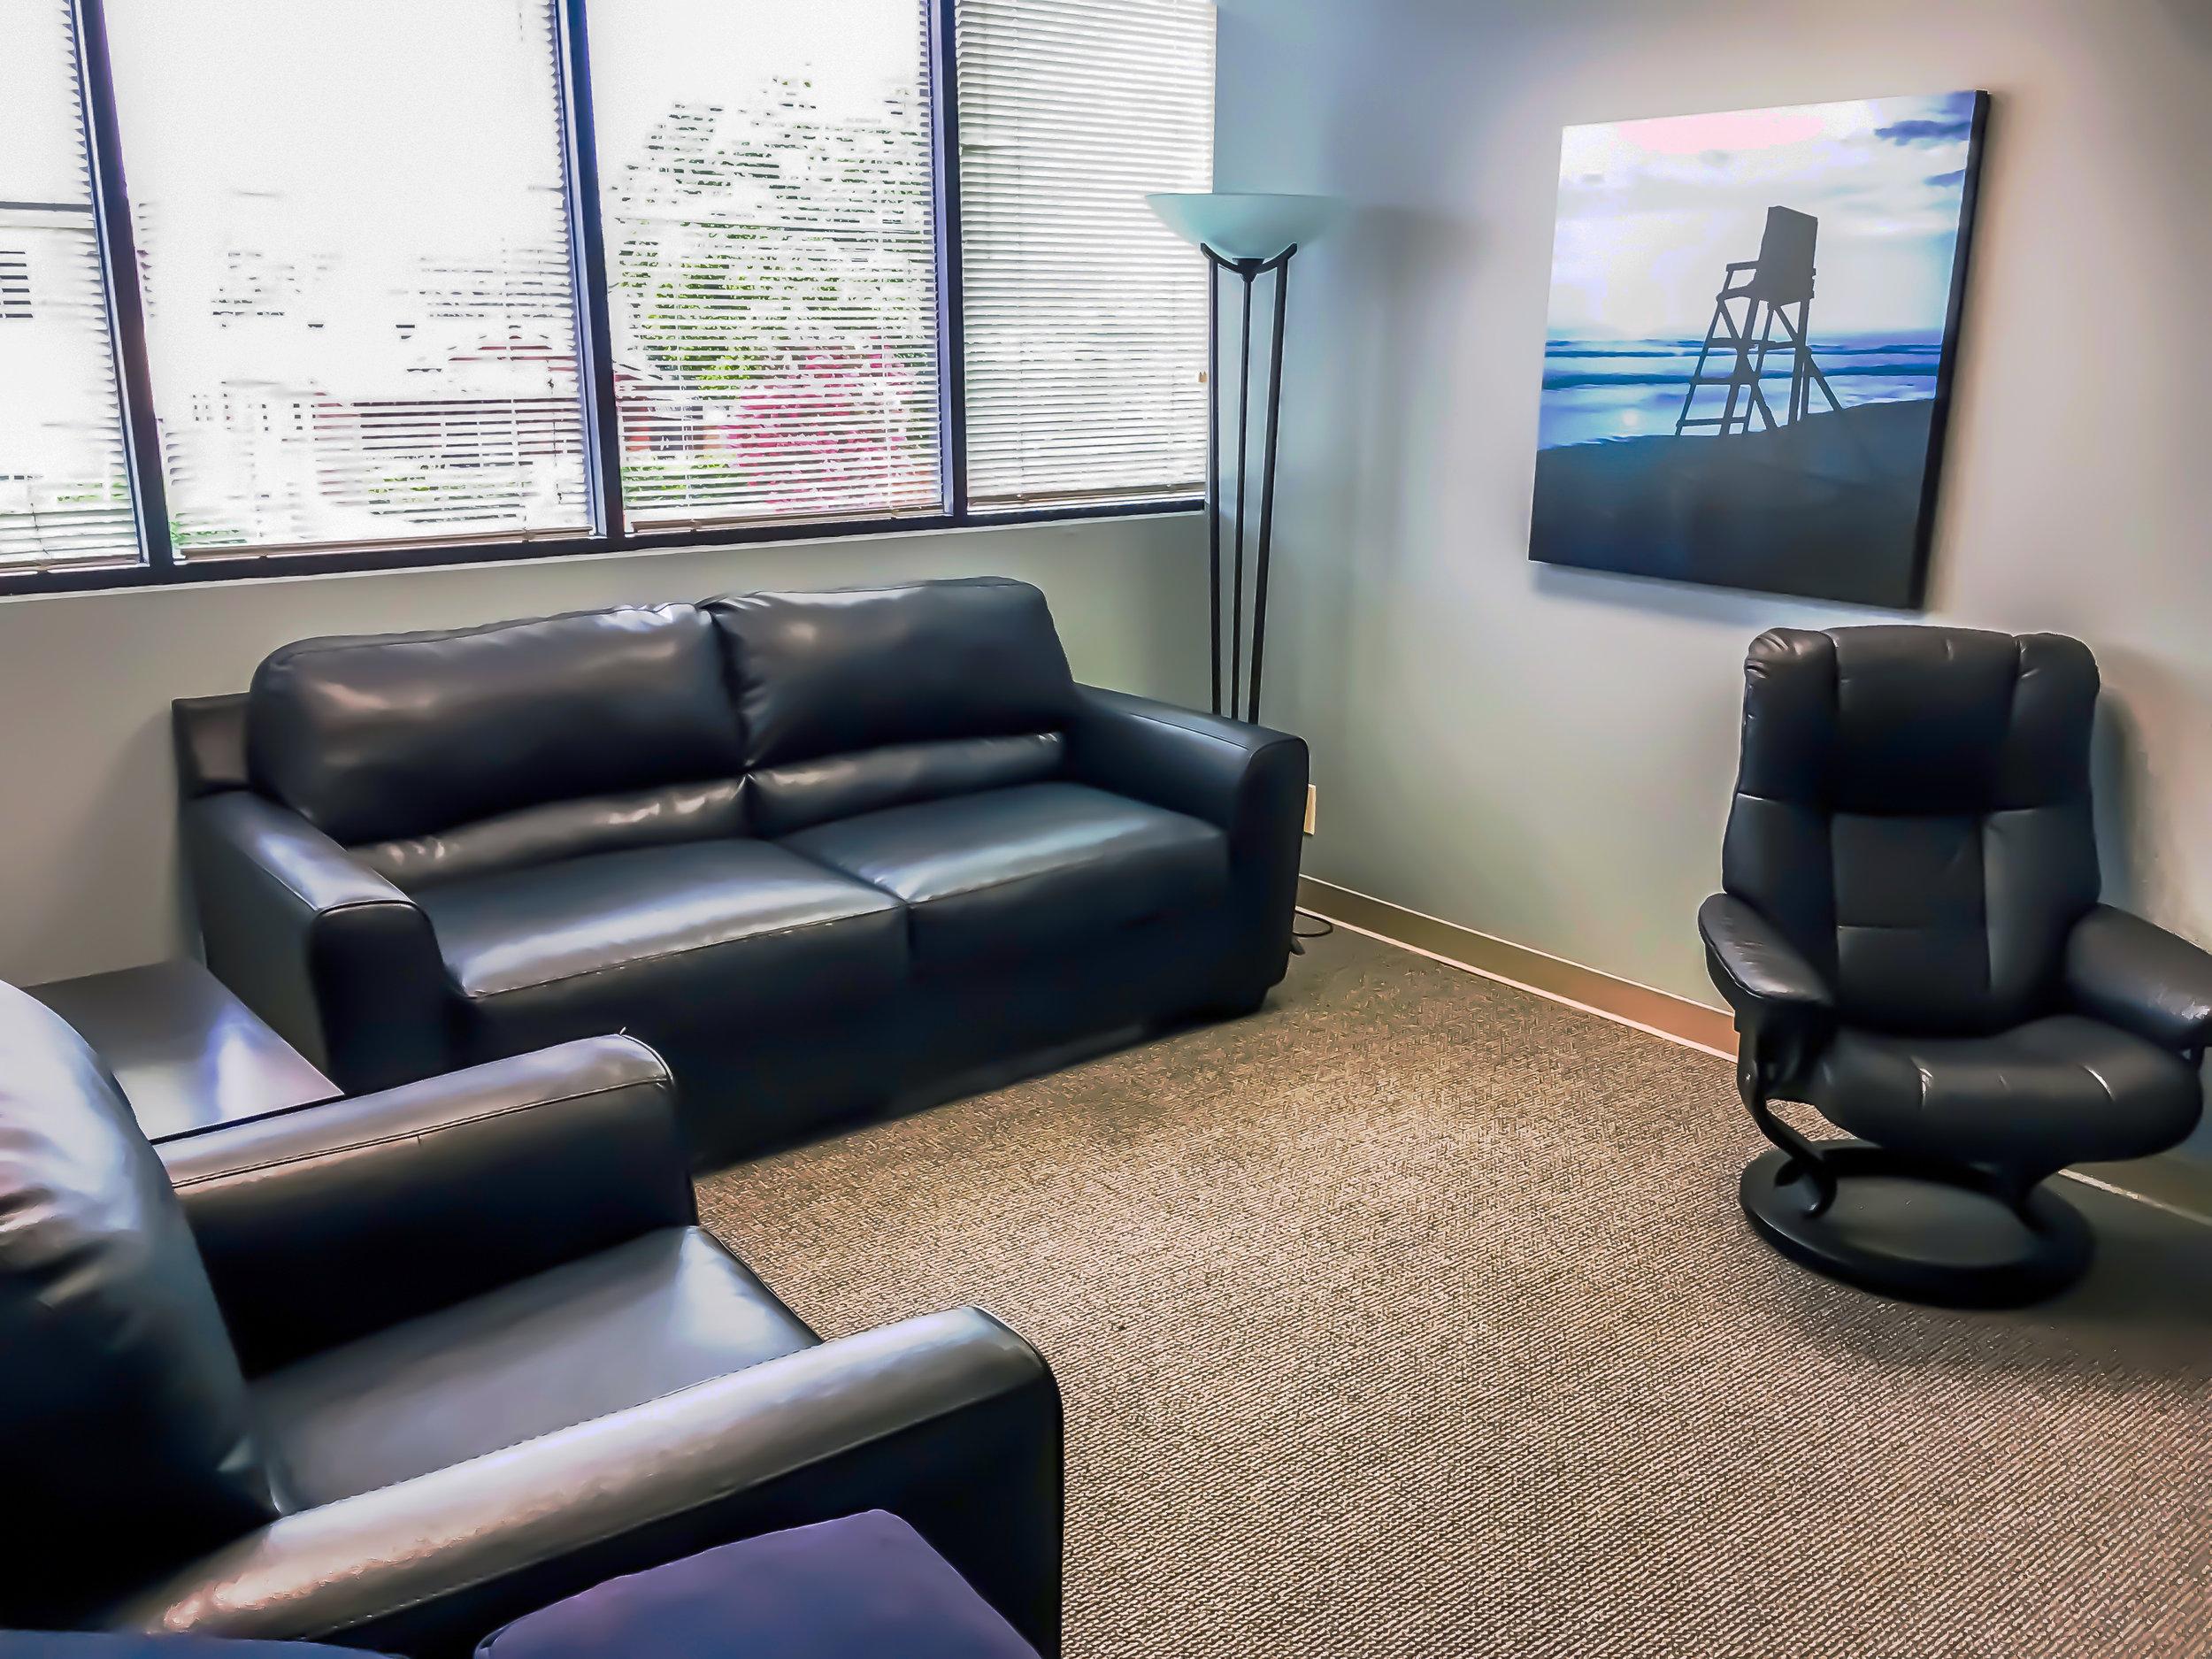 Office Waiting Room.JPEG